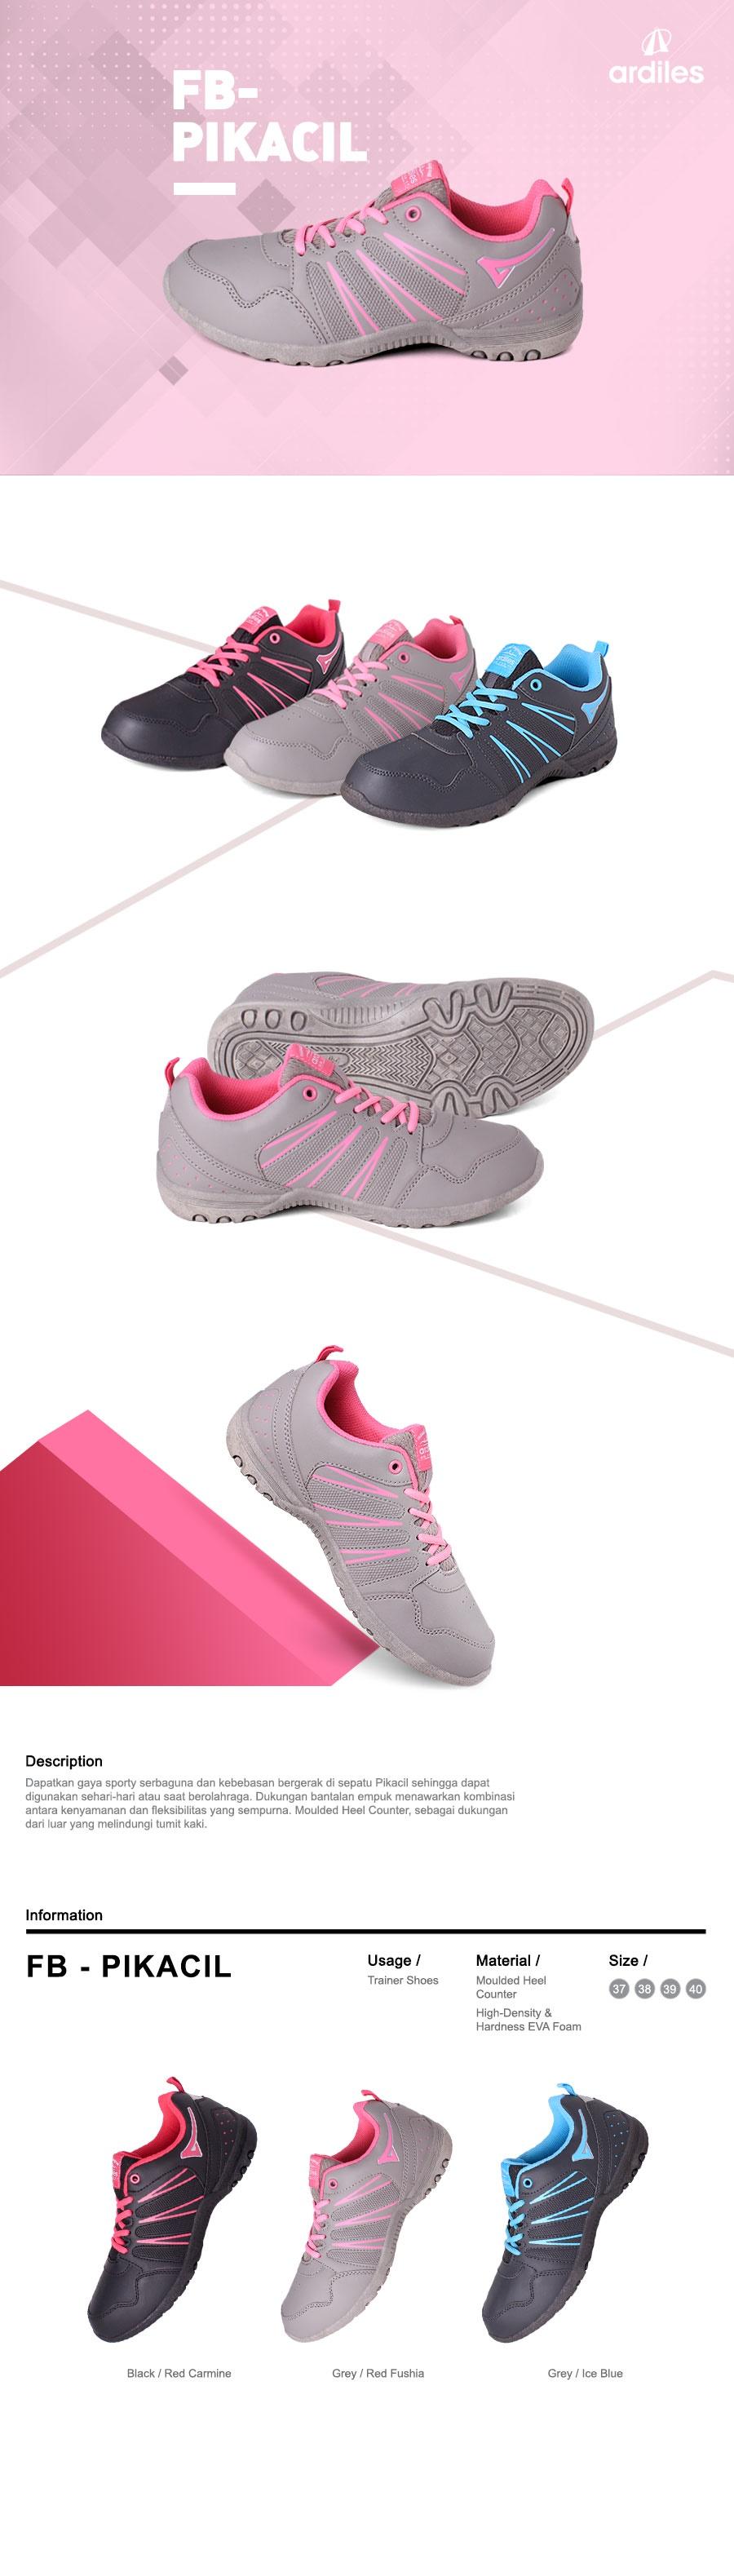 Ardiles Women Marimar Running Shoes Abu Hijau Turqouise Daftar Men Articuno Grey Black Clearance Sale Update Style And Kids